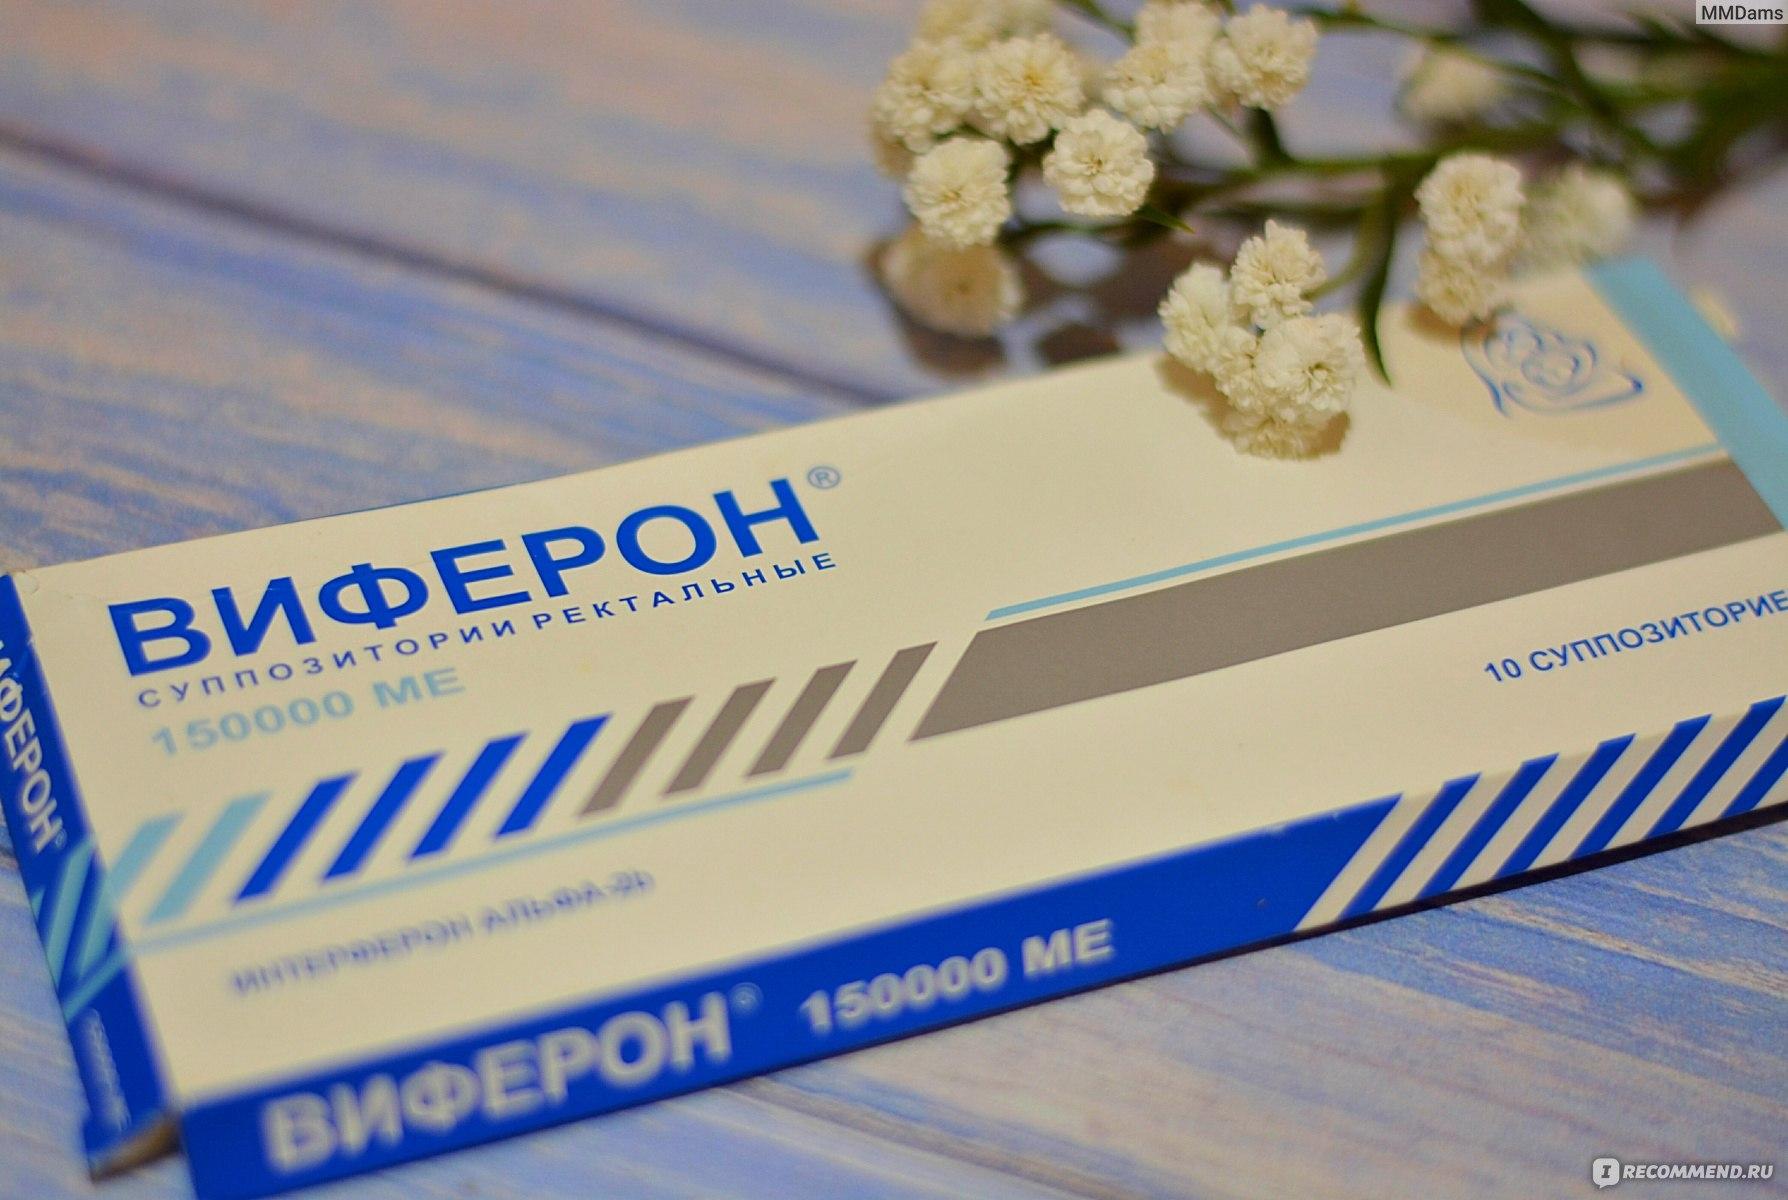 свечи виферон для лечения простатита